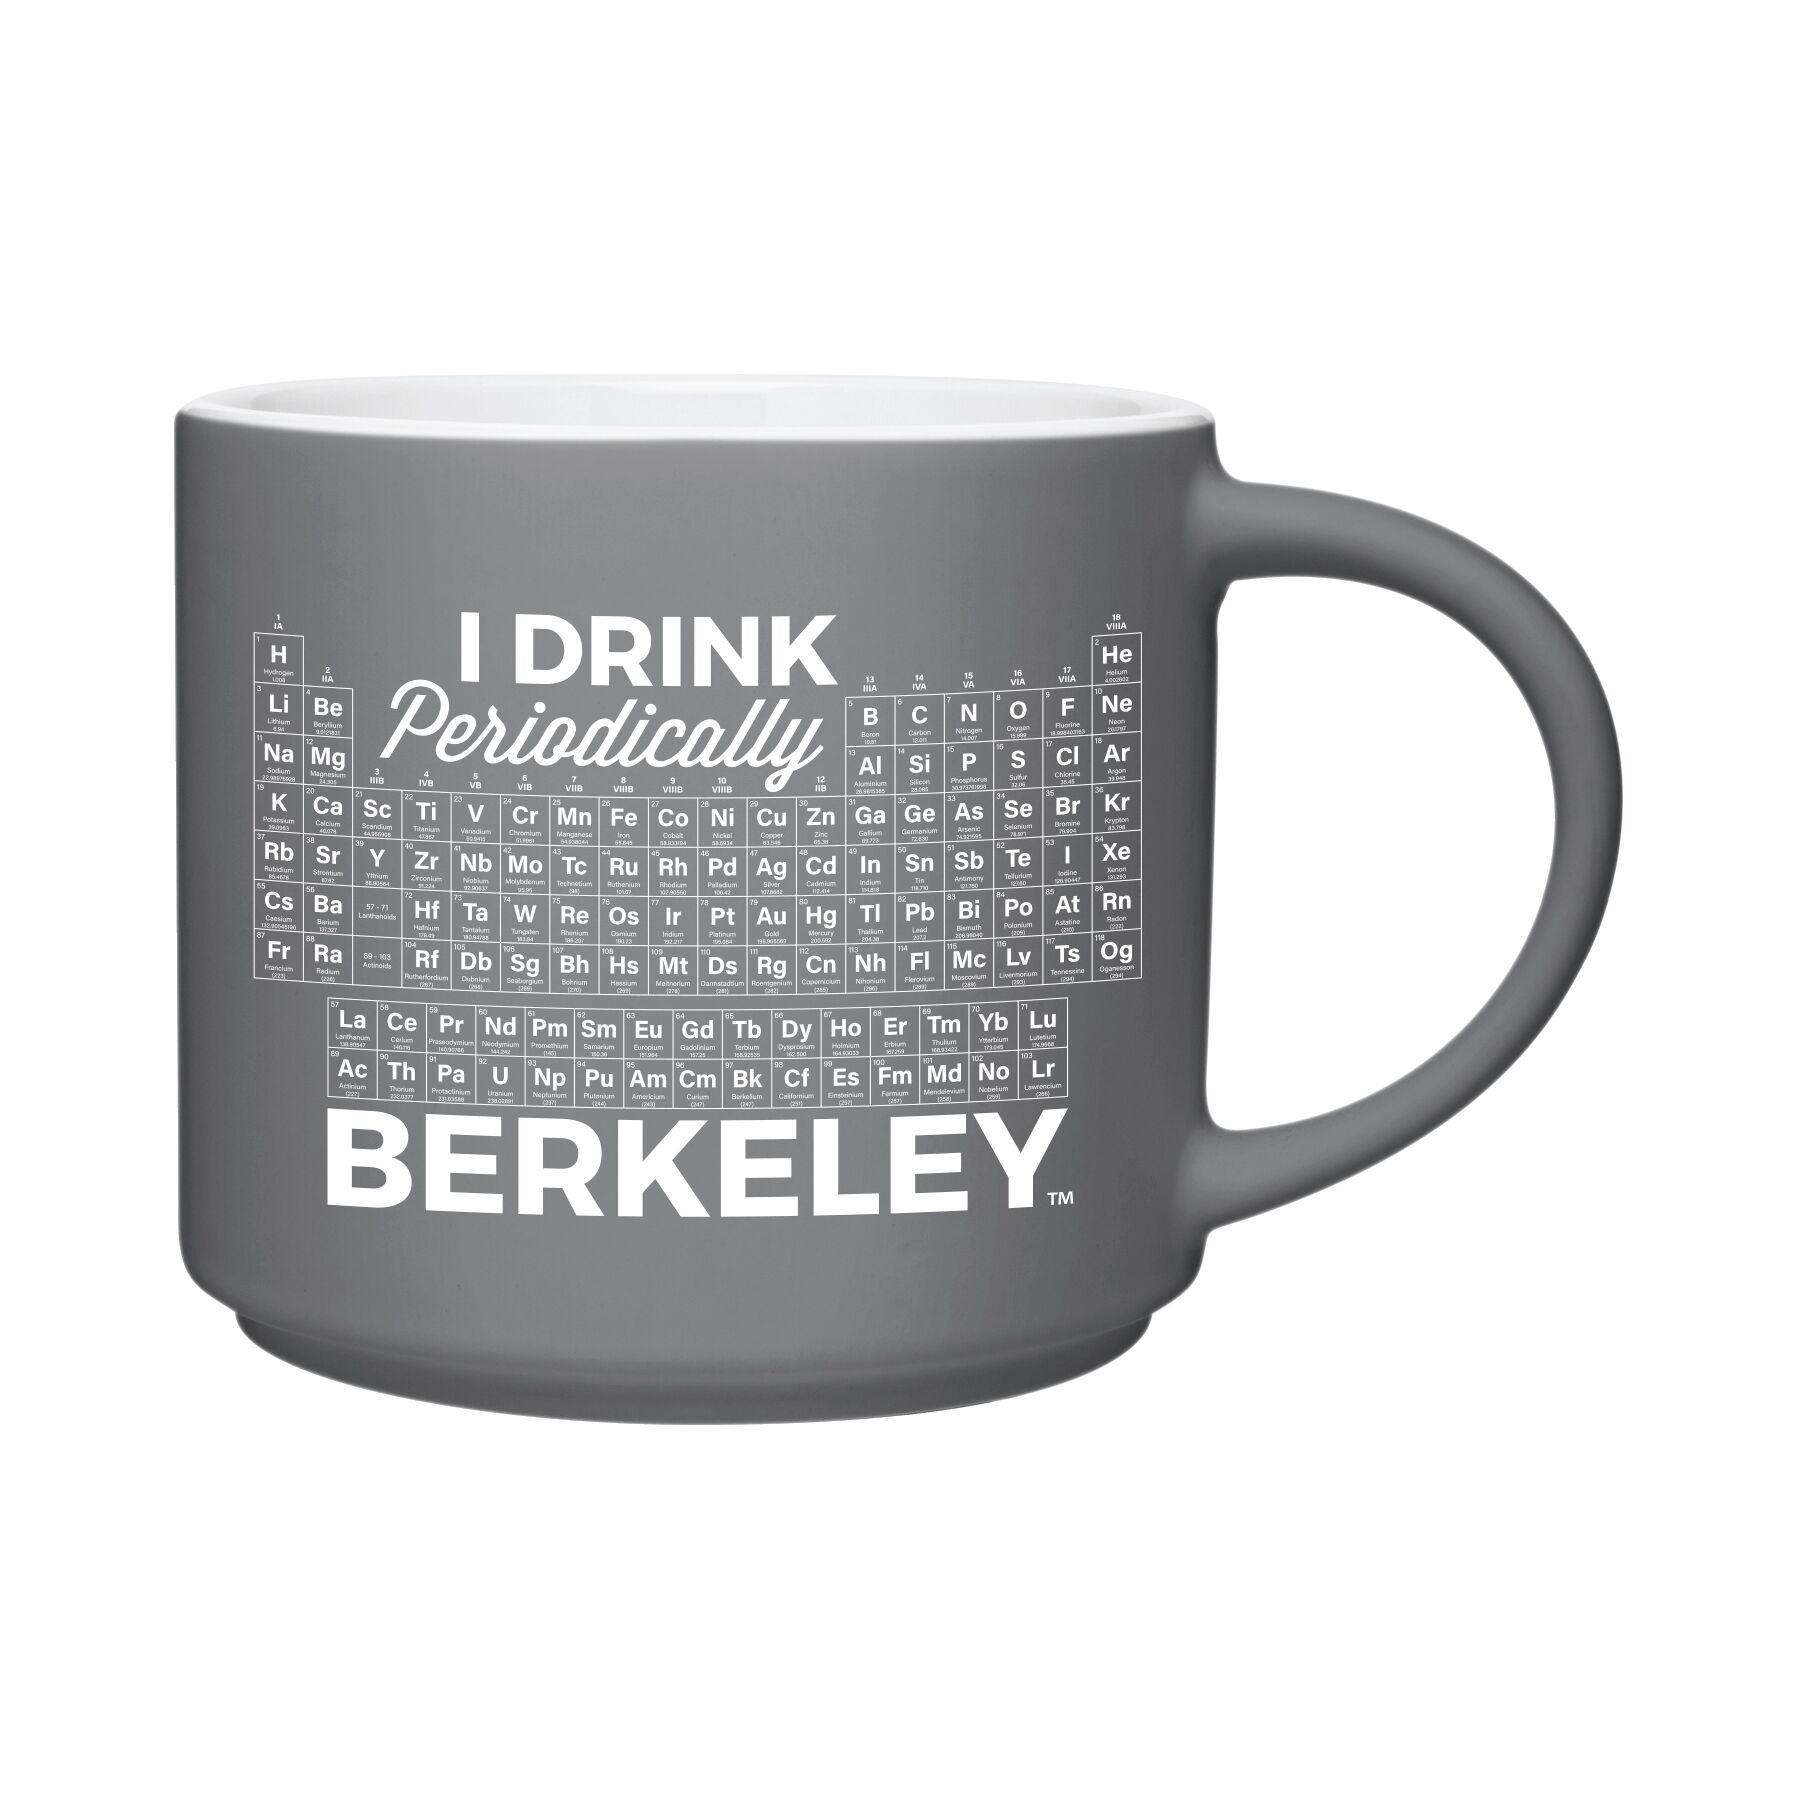 Cal Bears 16oz Riviera Mug Matte Gray Drink Periodically